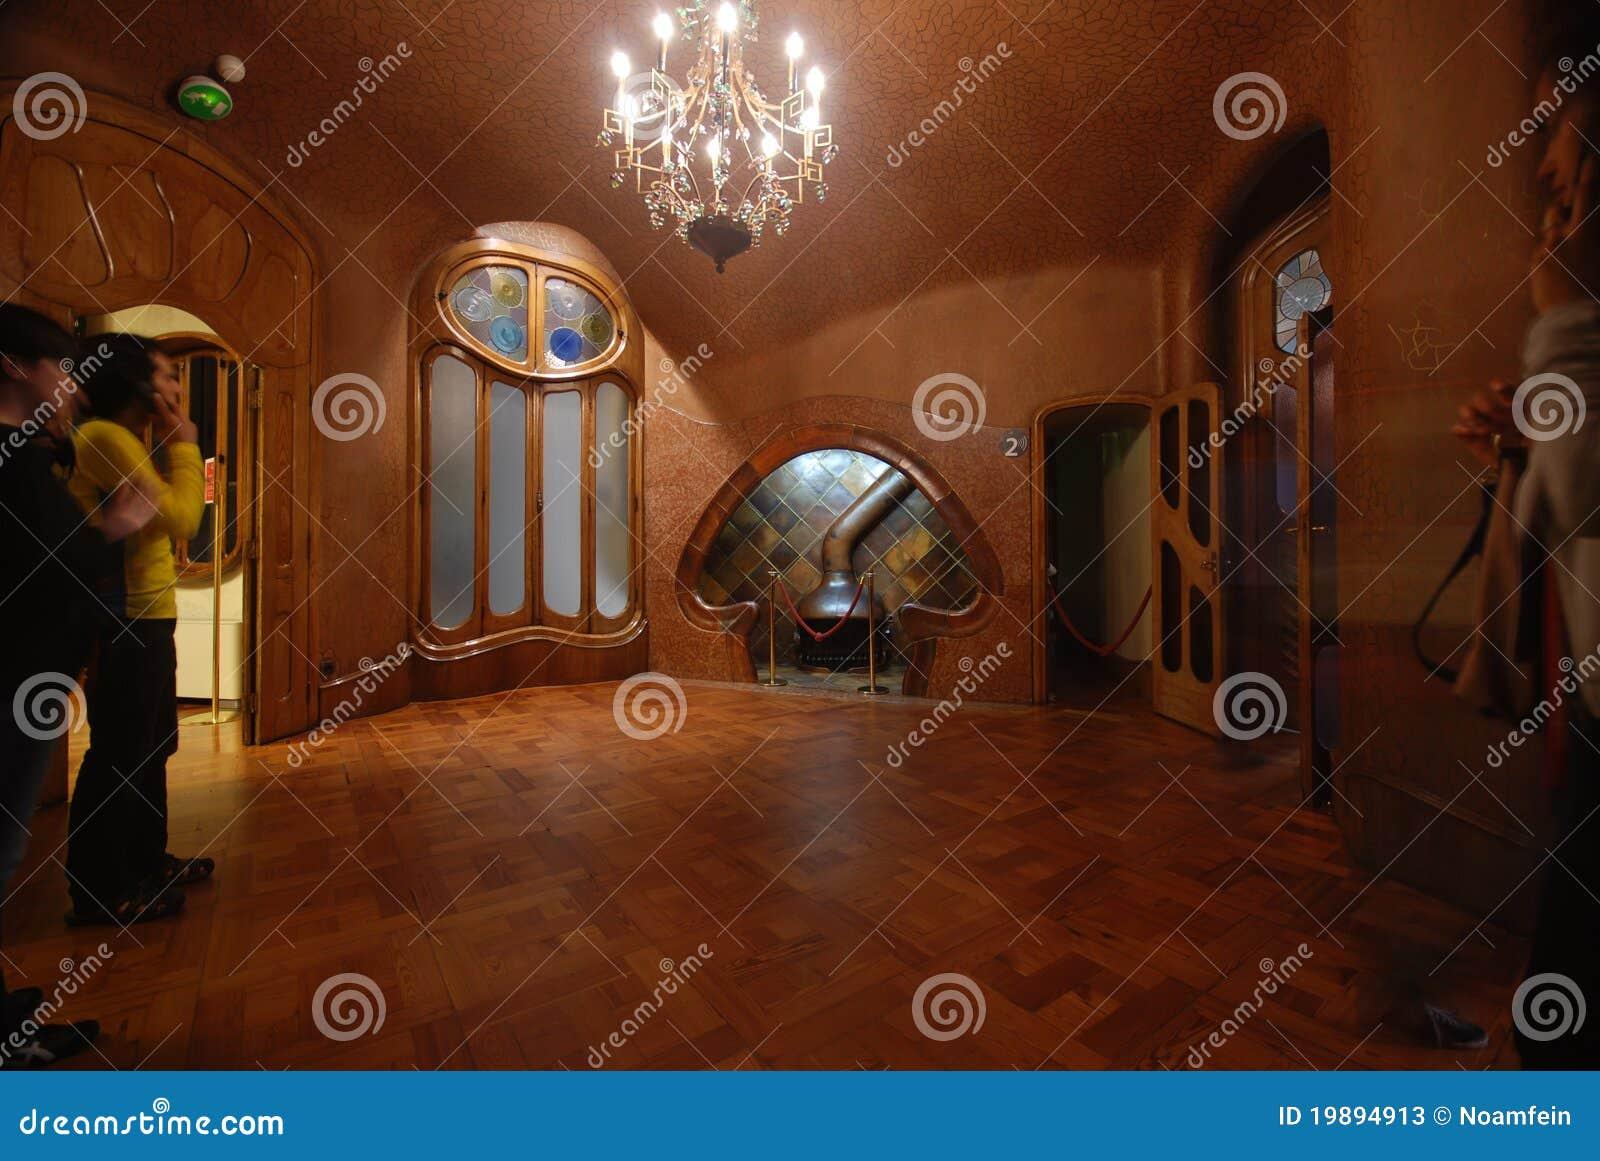 Interior of casa batllo editorial stock photo image of for Casa interior